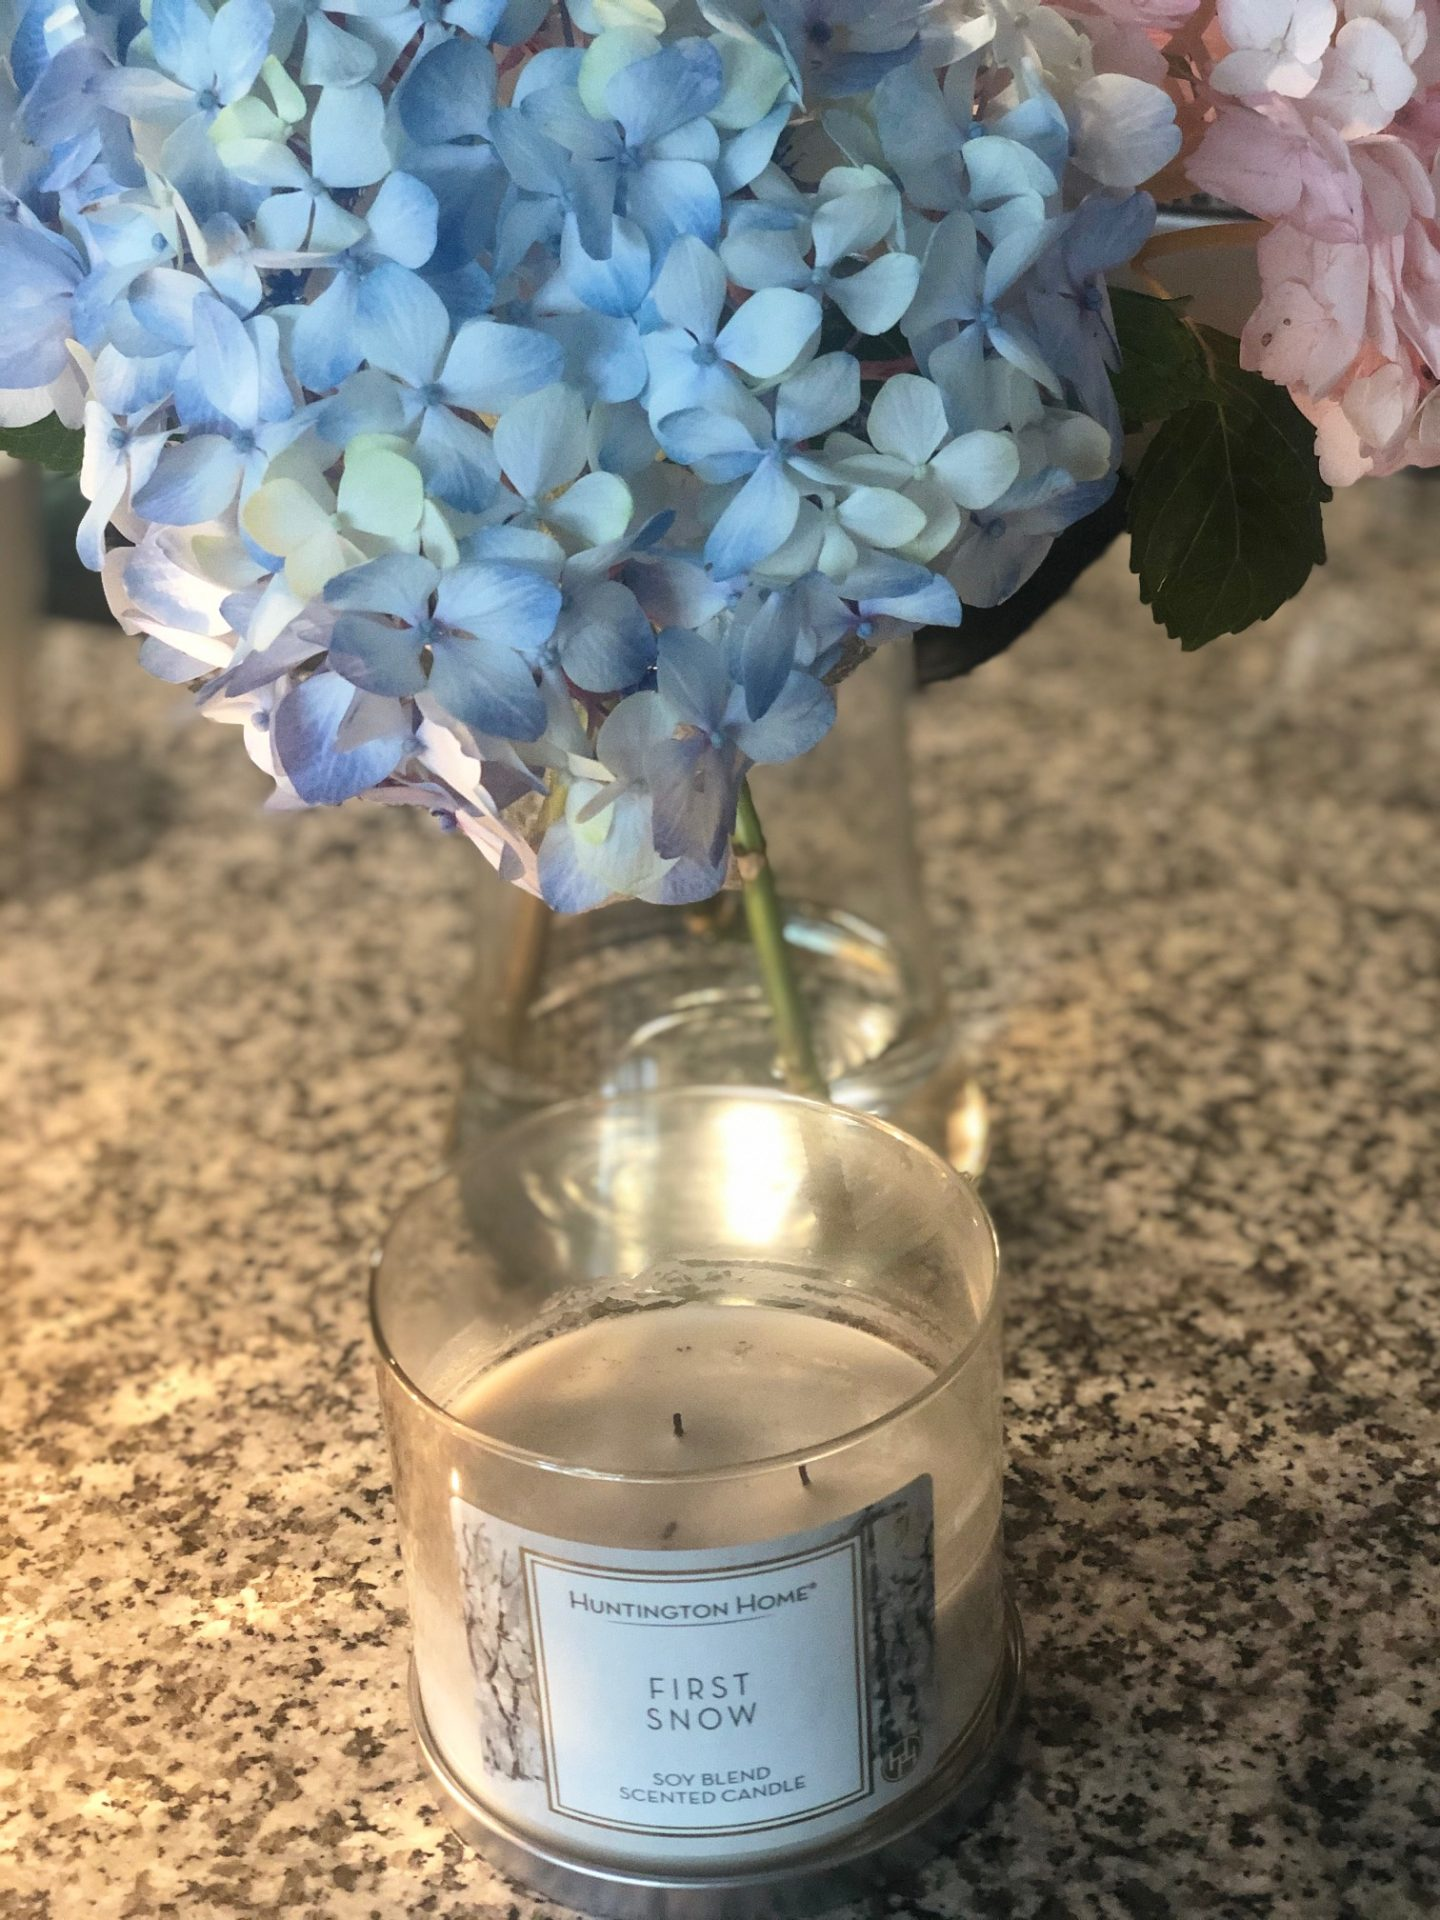 Huntington Home Candle